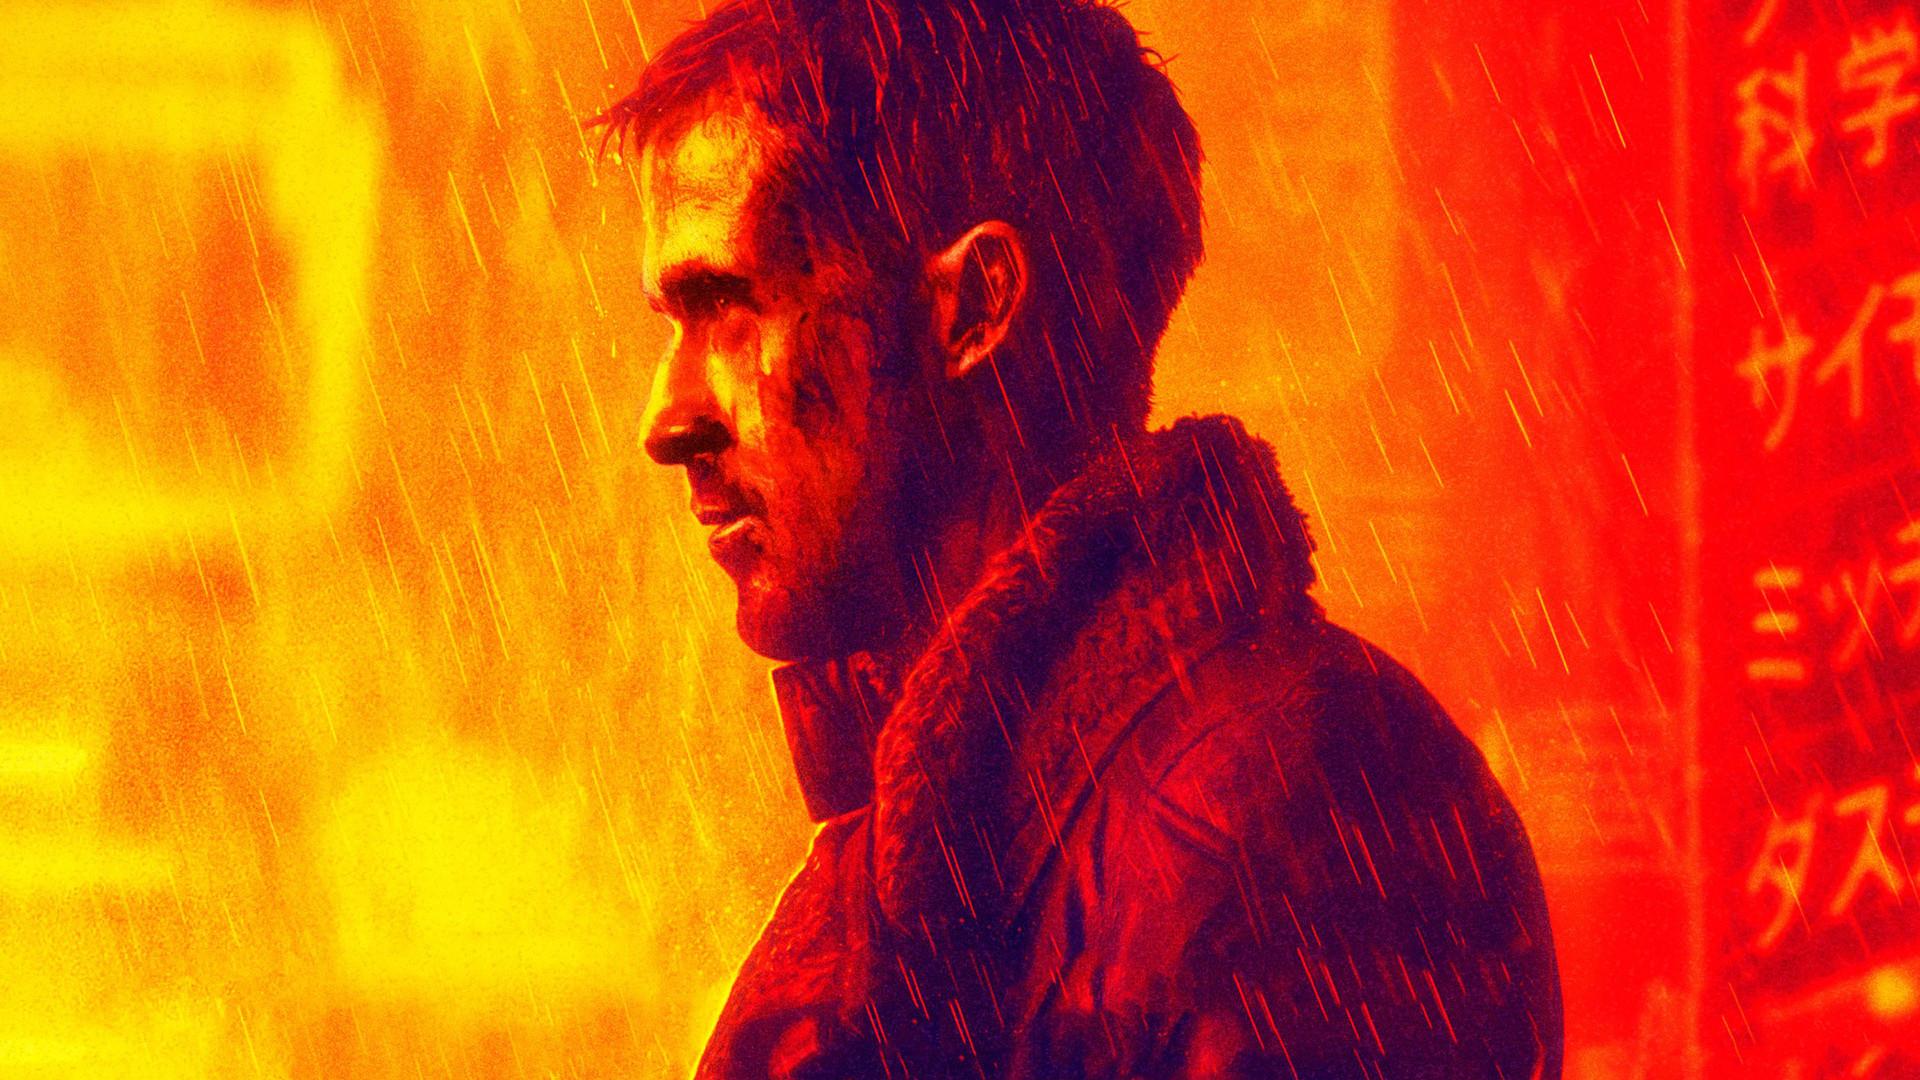 Ryan Gosling Blade Runner 2049 hd Wallpaper